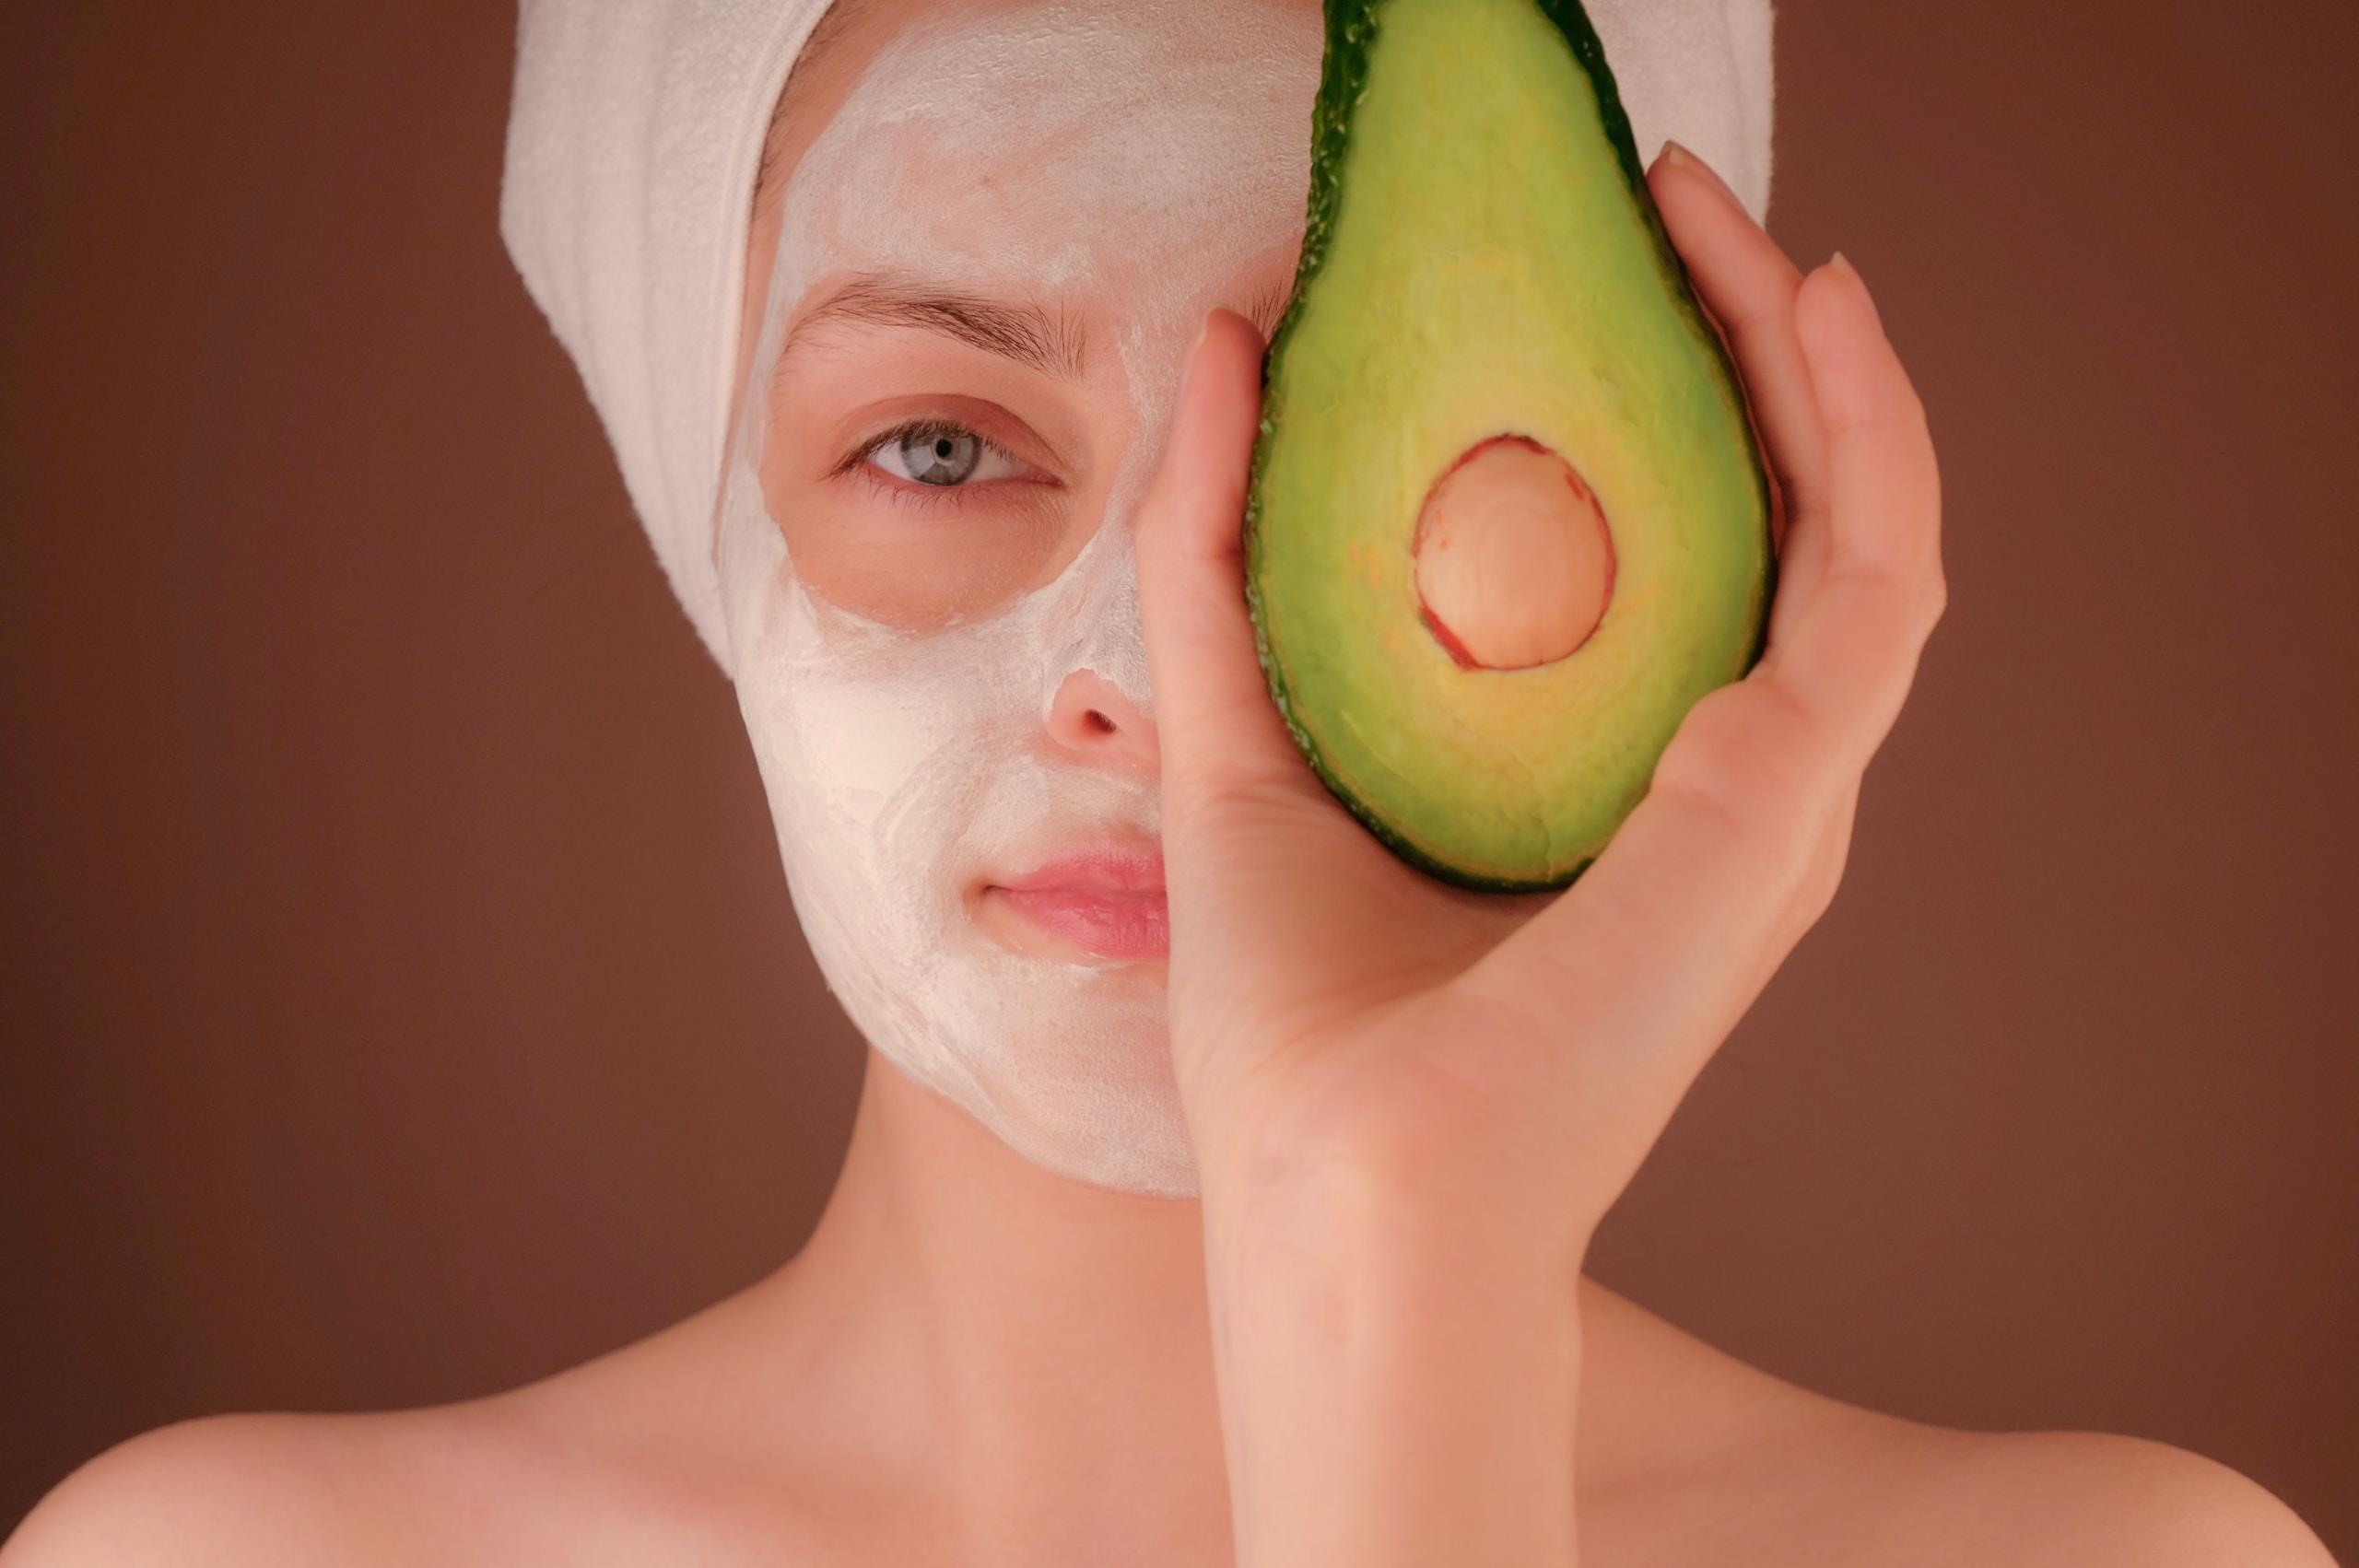 cuidado de la piel, woman with white face mask holding green fruit